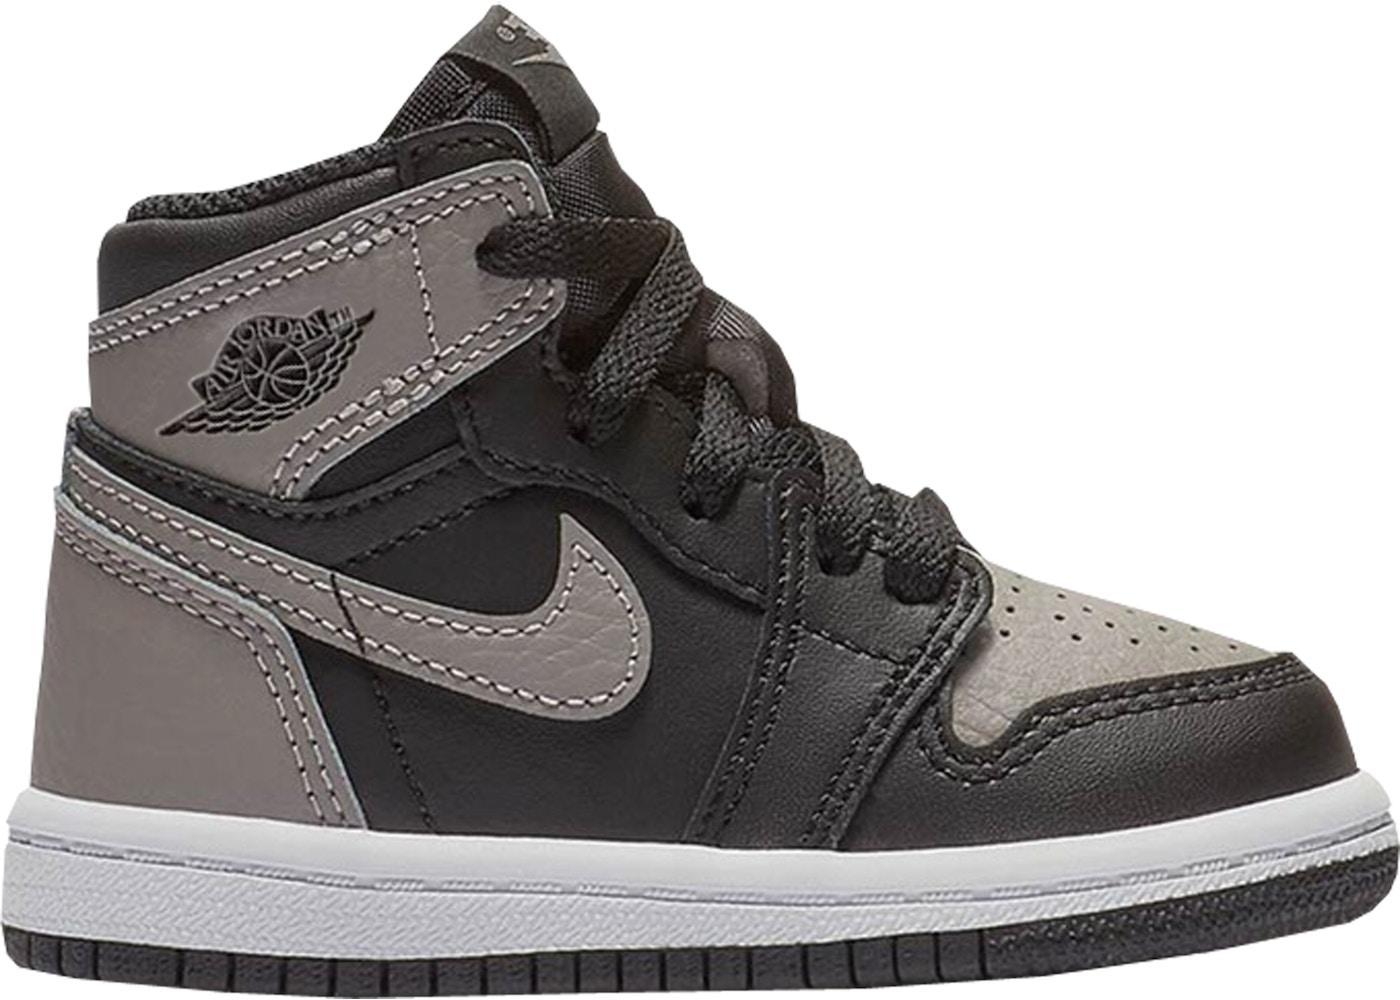 size 40 46606 5e92e Air Jordan 1 Size 5 Shoes - Average Sale Price